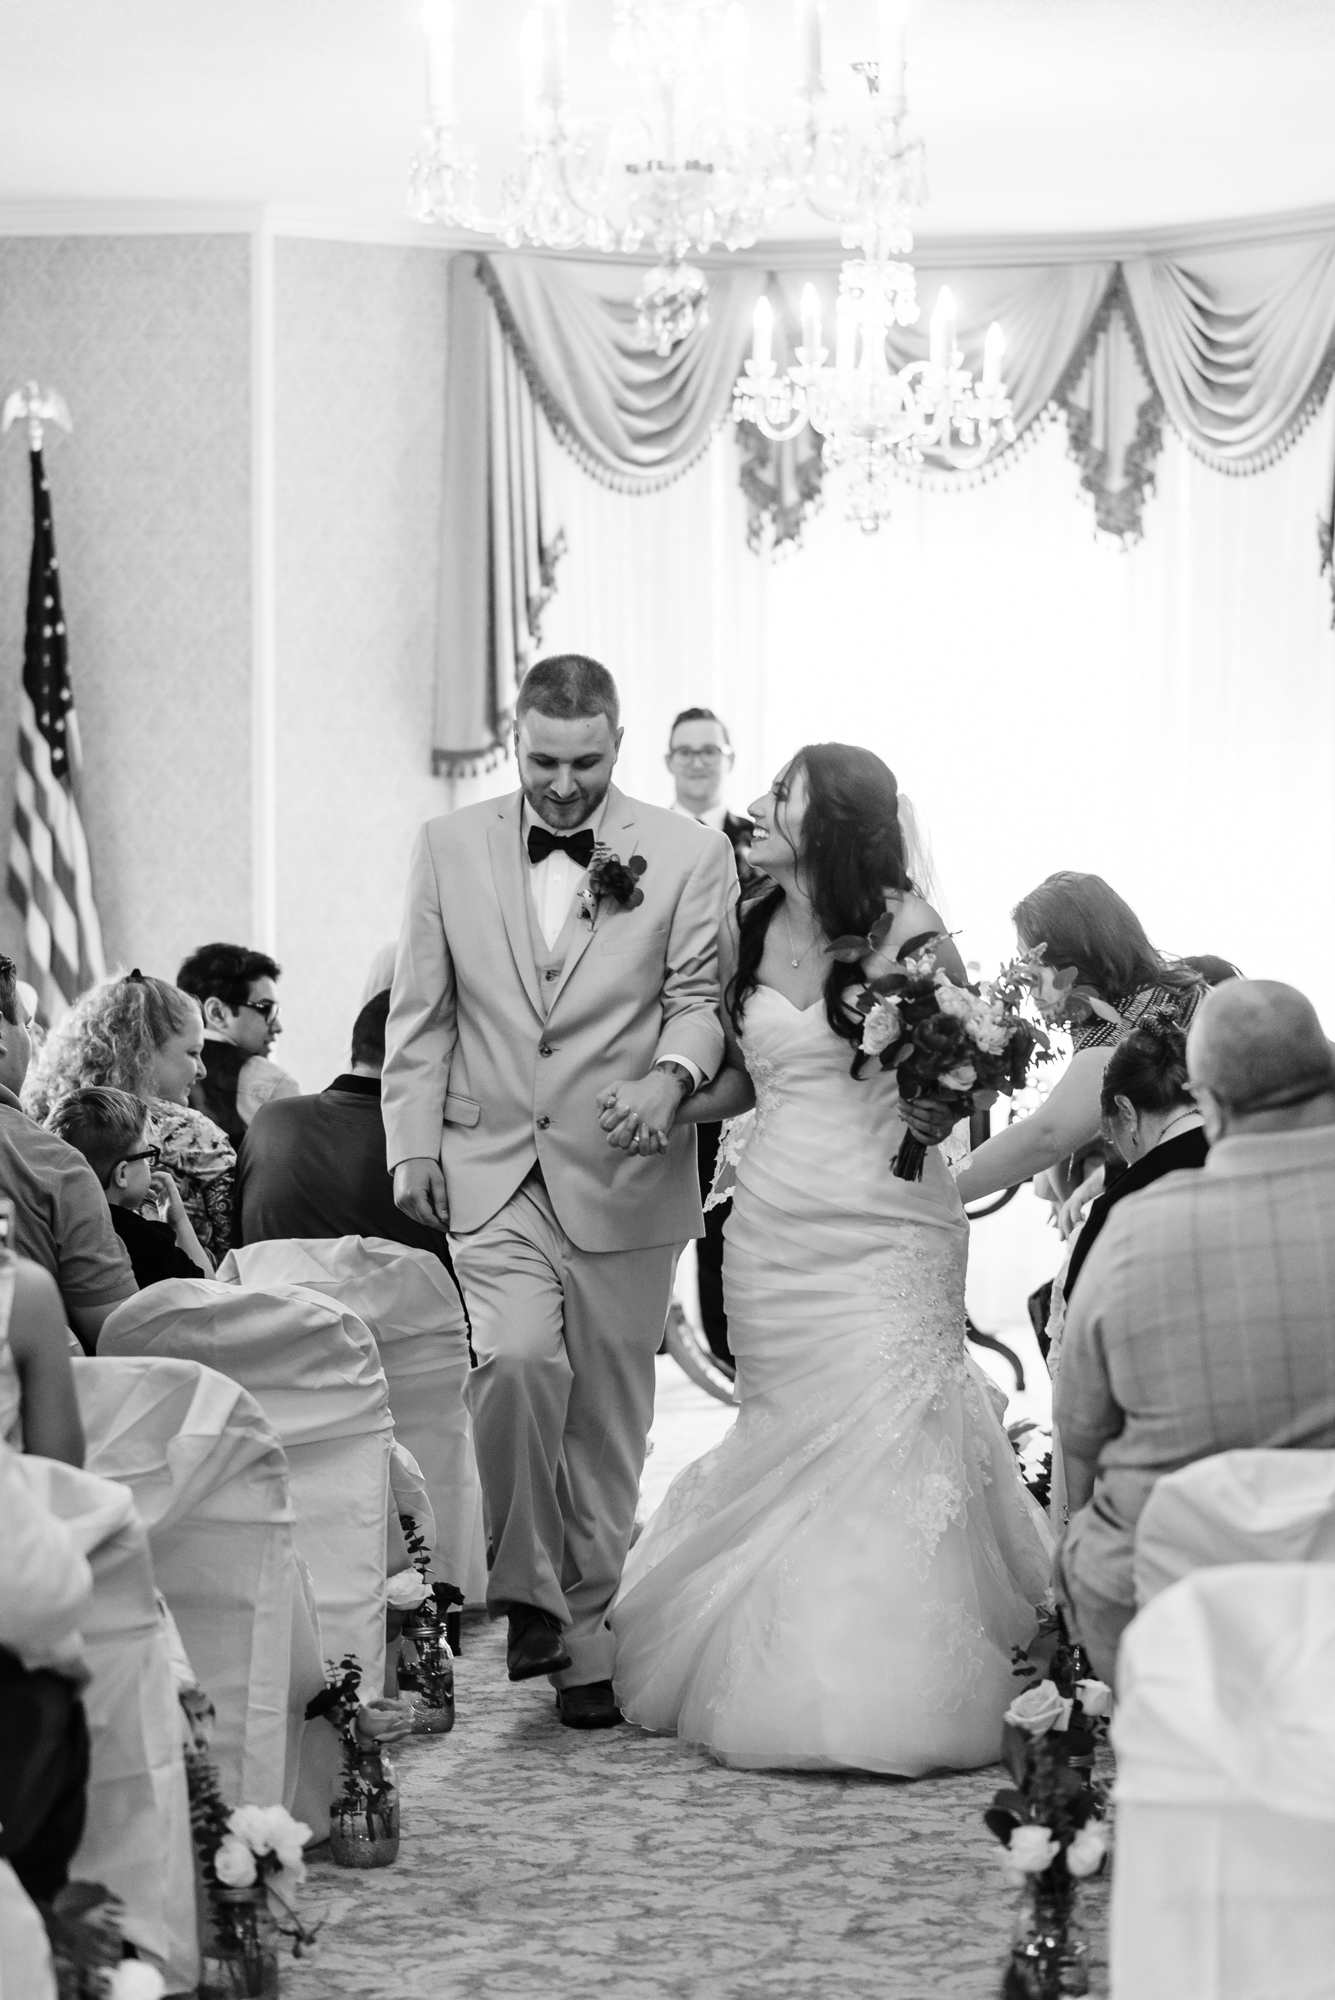 Snowden House - Waterloo, Iowa, Wedding Photographer